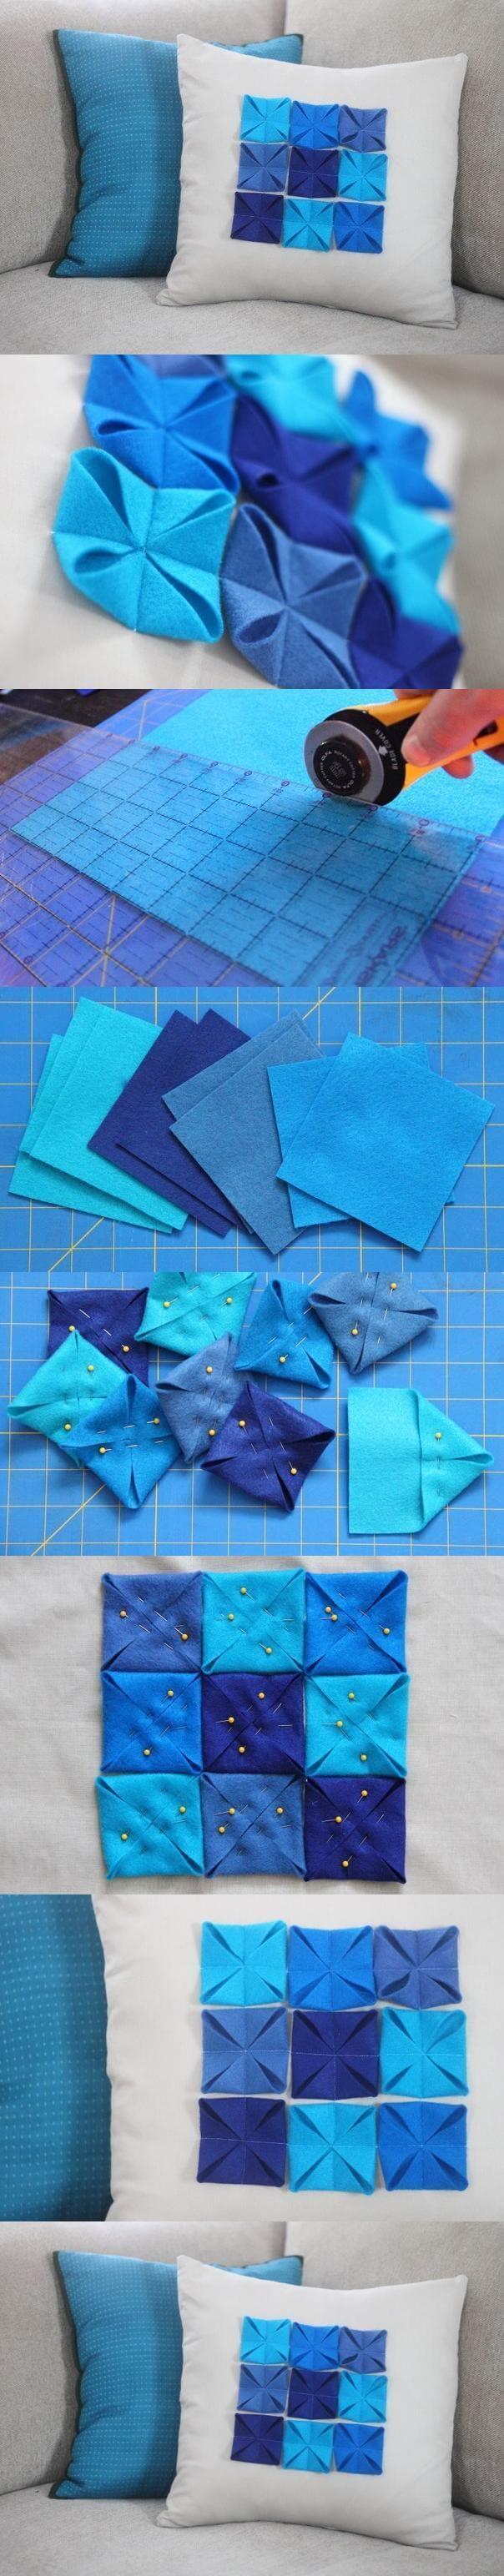 DIY felt Cushion Cover idea Stylish DIY Pillow Craft Ideas - Step by step